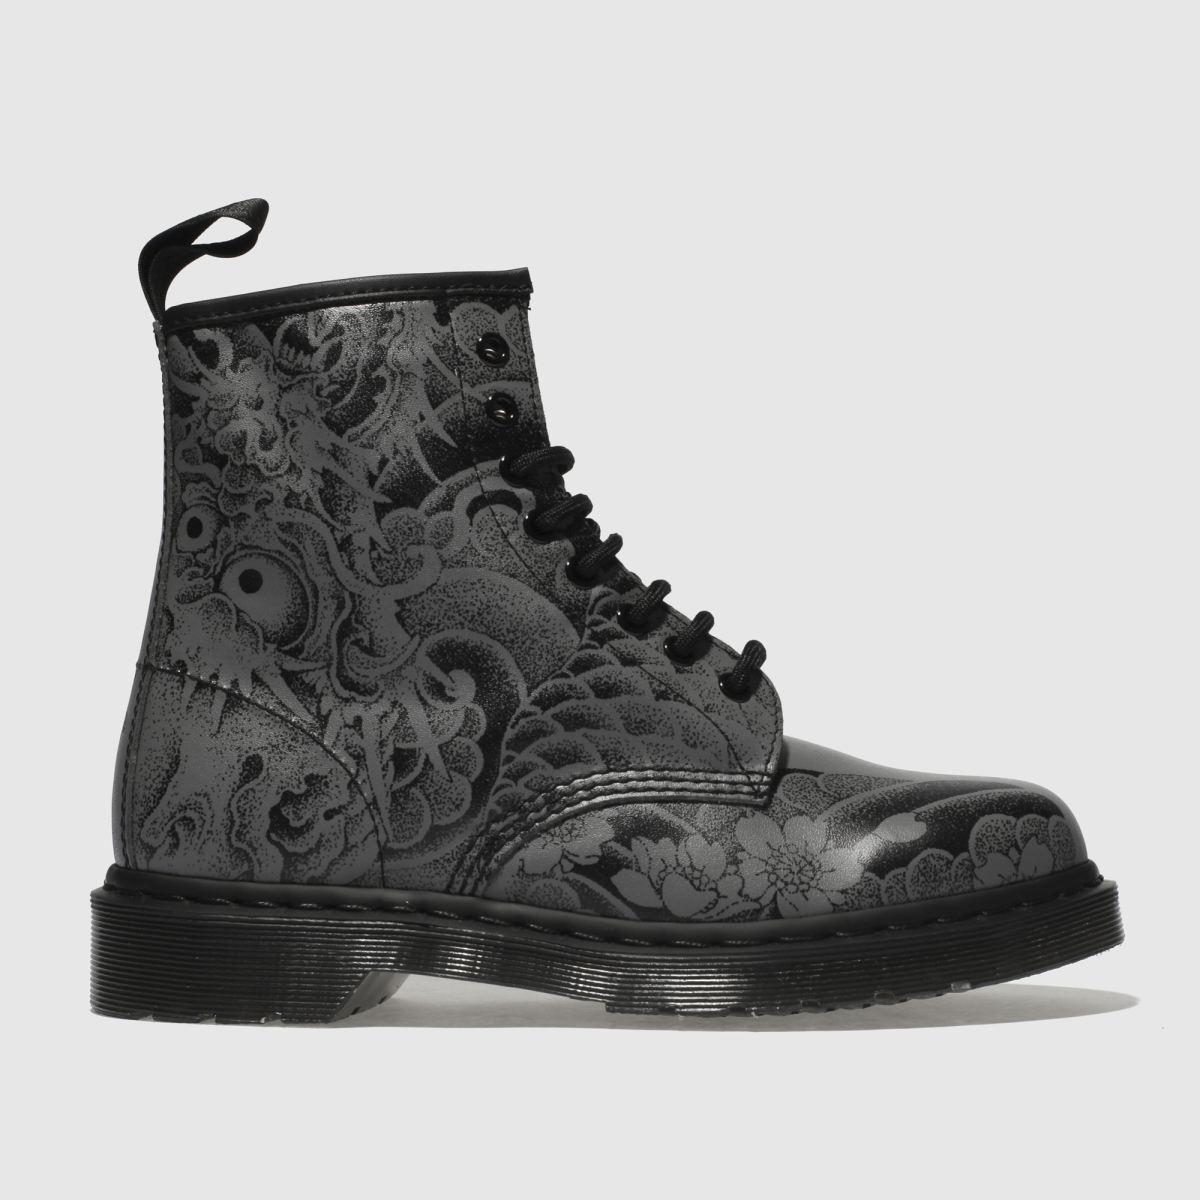 Dr Martens Black & Grey 1460 Ot Tattoo Backhand 8-eye Boots